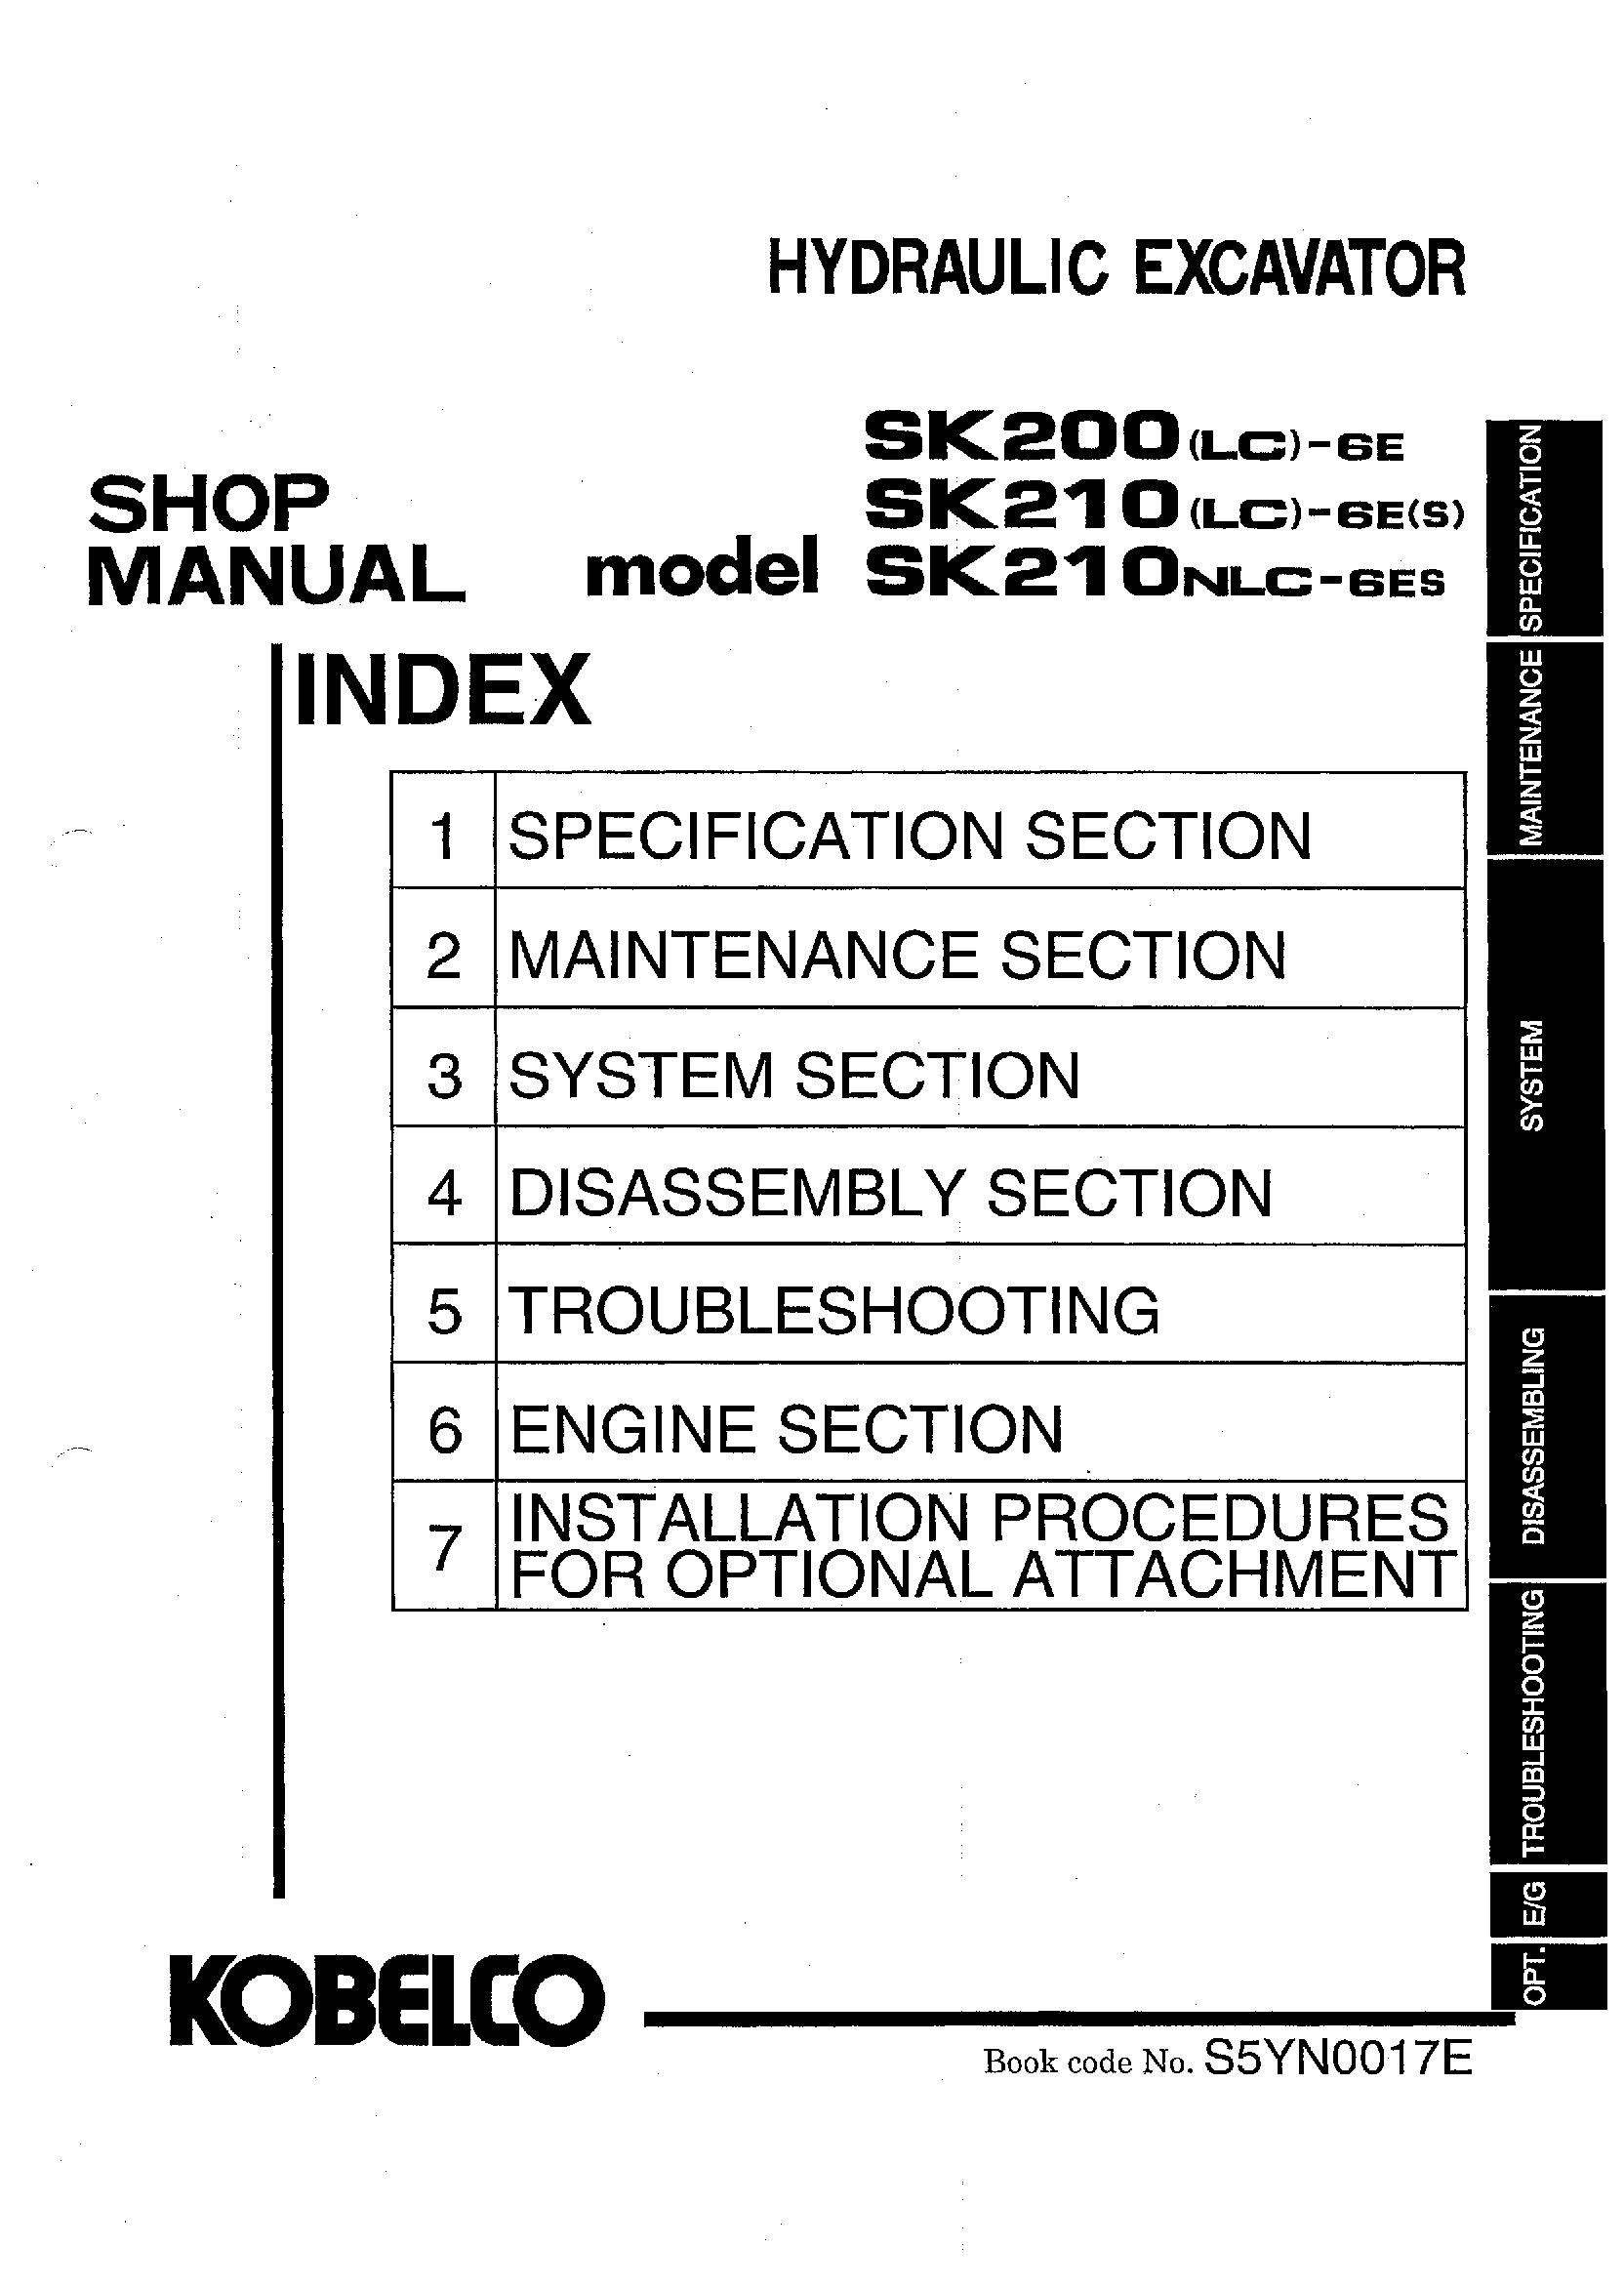 Kobelco SK200(LC)-6E Manual in 2020 | Hydraulic excavator, Electrical  circuit diagram, ExcavatorPinterest